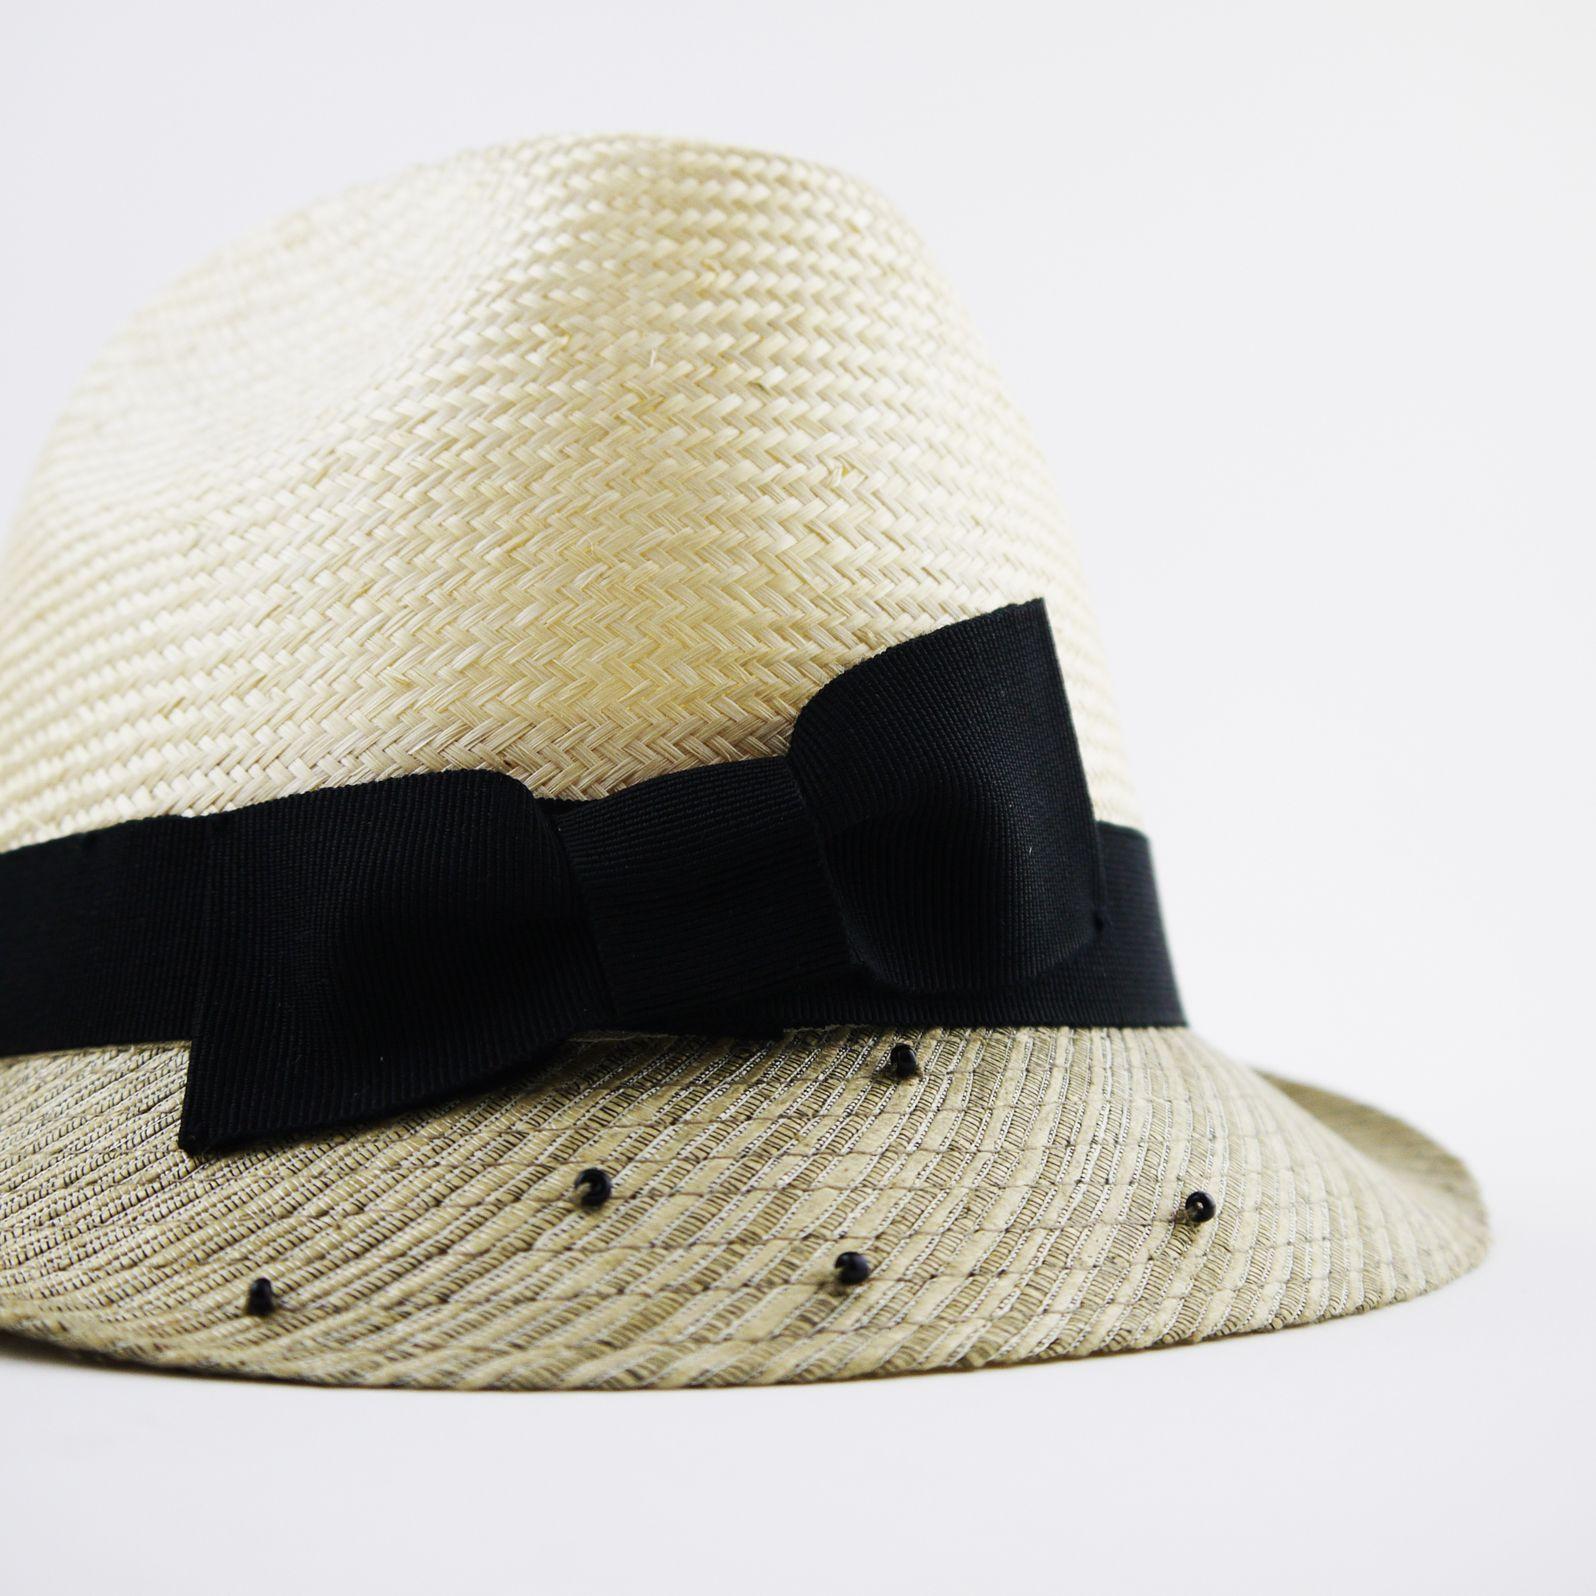 PANAMA WOMAN HAT CAPPELLO DONNA IN PANAMA